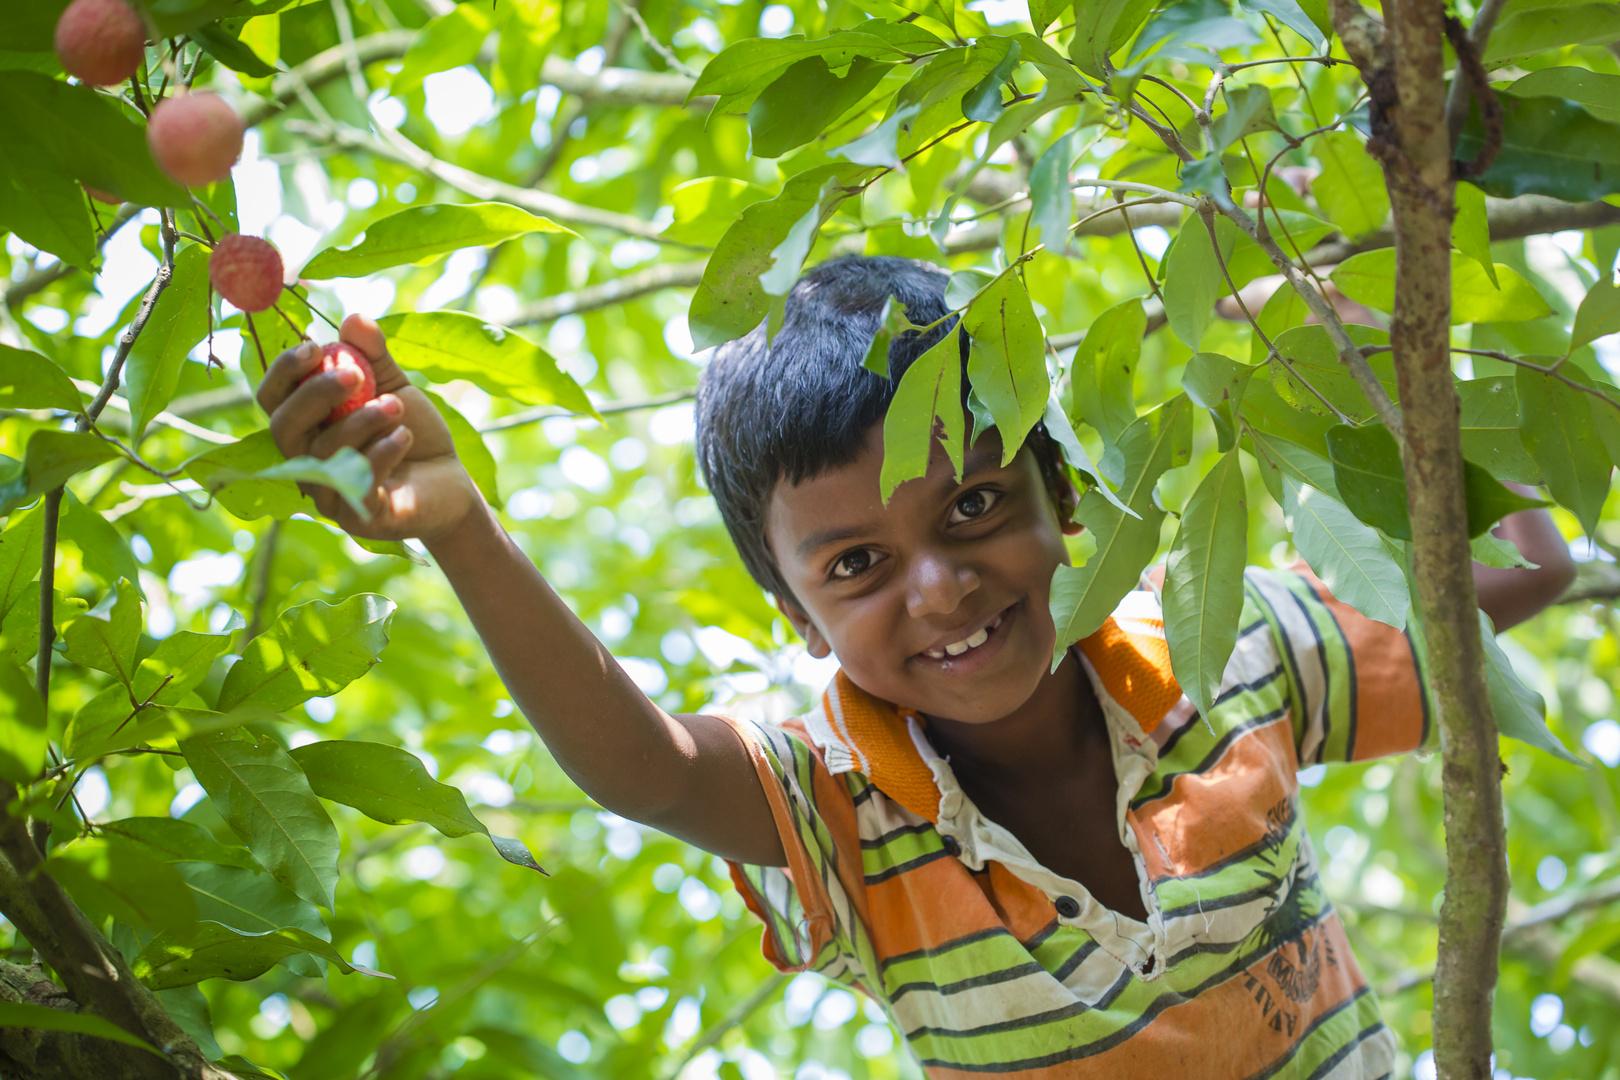 A kid plucks lychee.